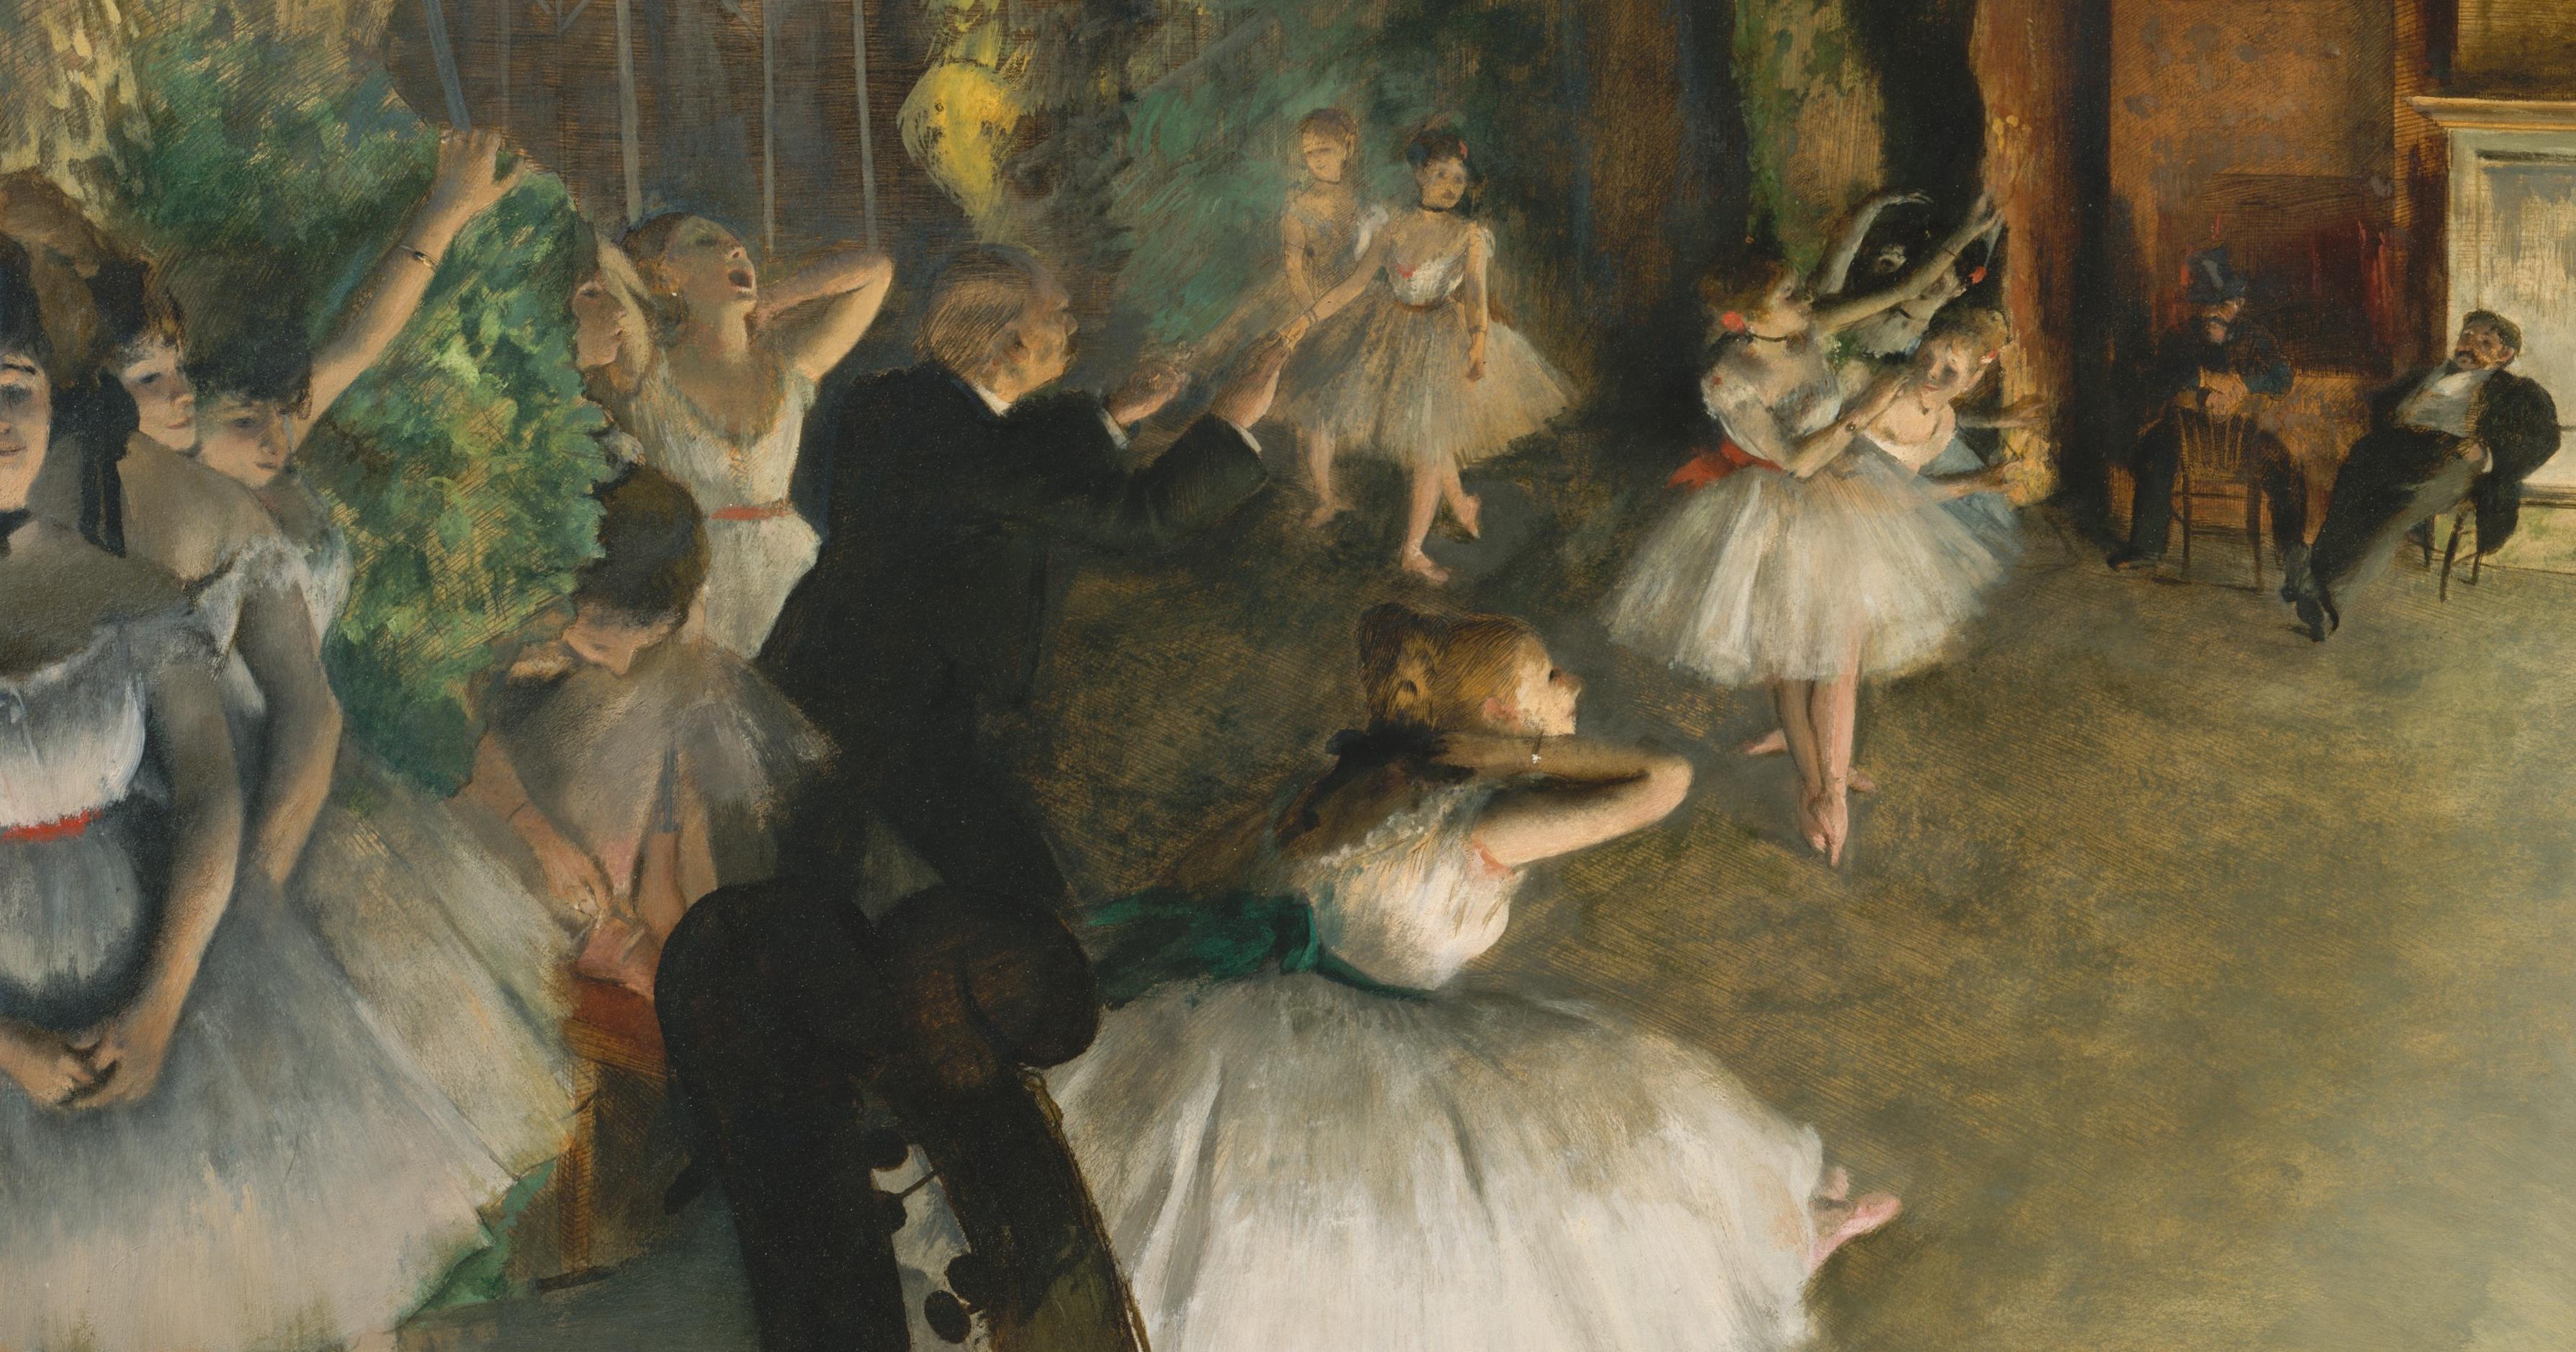 2d5b57da2864 Edgar Degas s Ballet Dancers Hide a Sordid Backstage Reality - Artsy